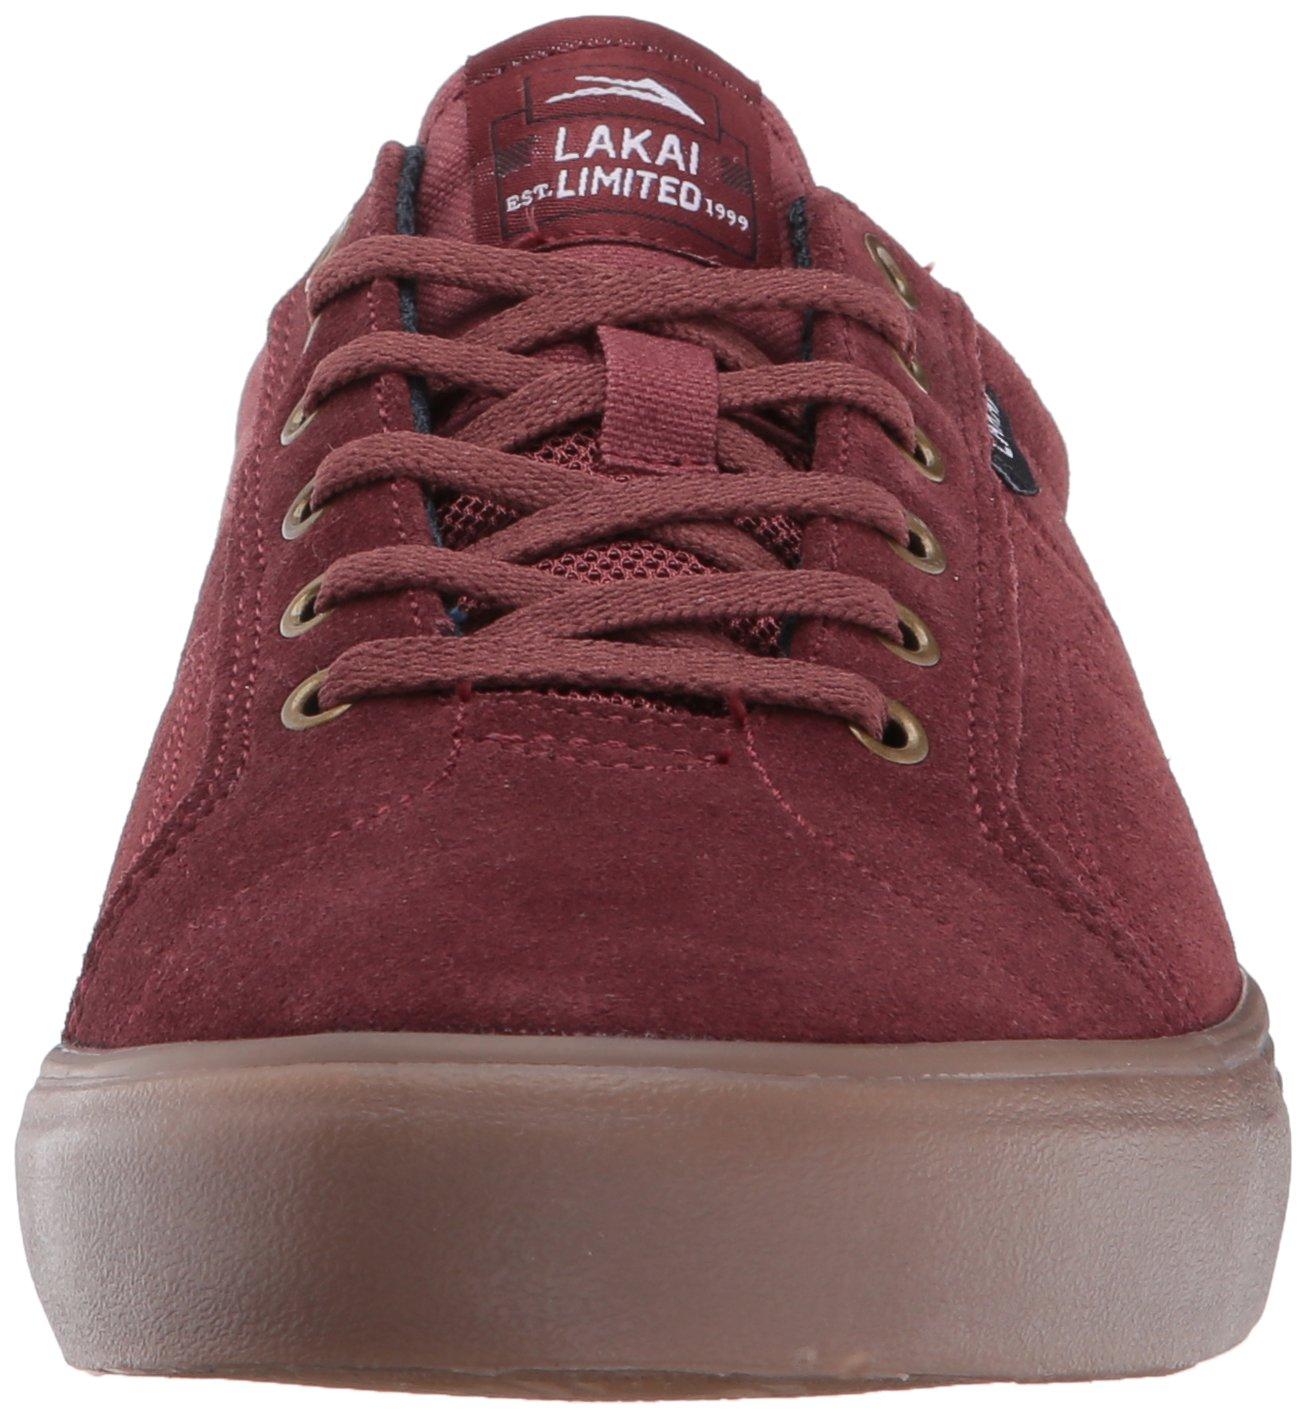 Lakai Flaco M Skate Shoe B01N4NNQE8 7 M Flaco US|Brick Suede 53f47c